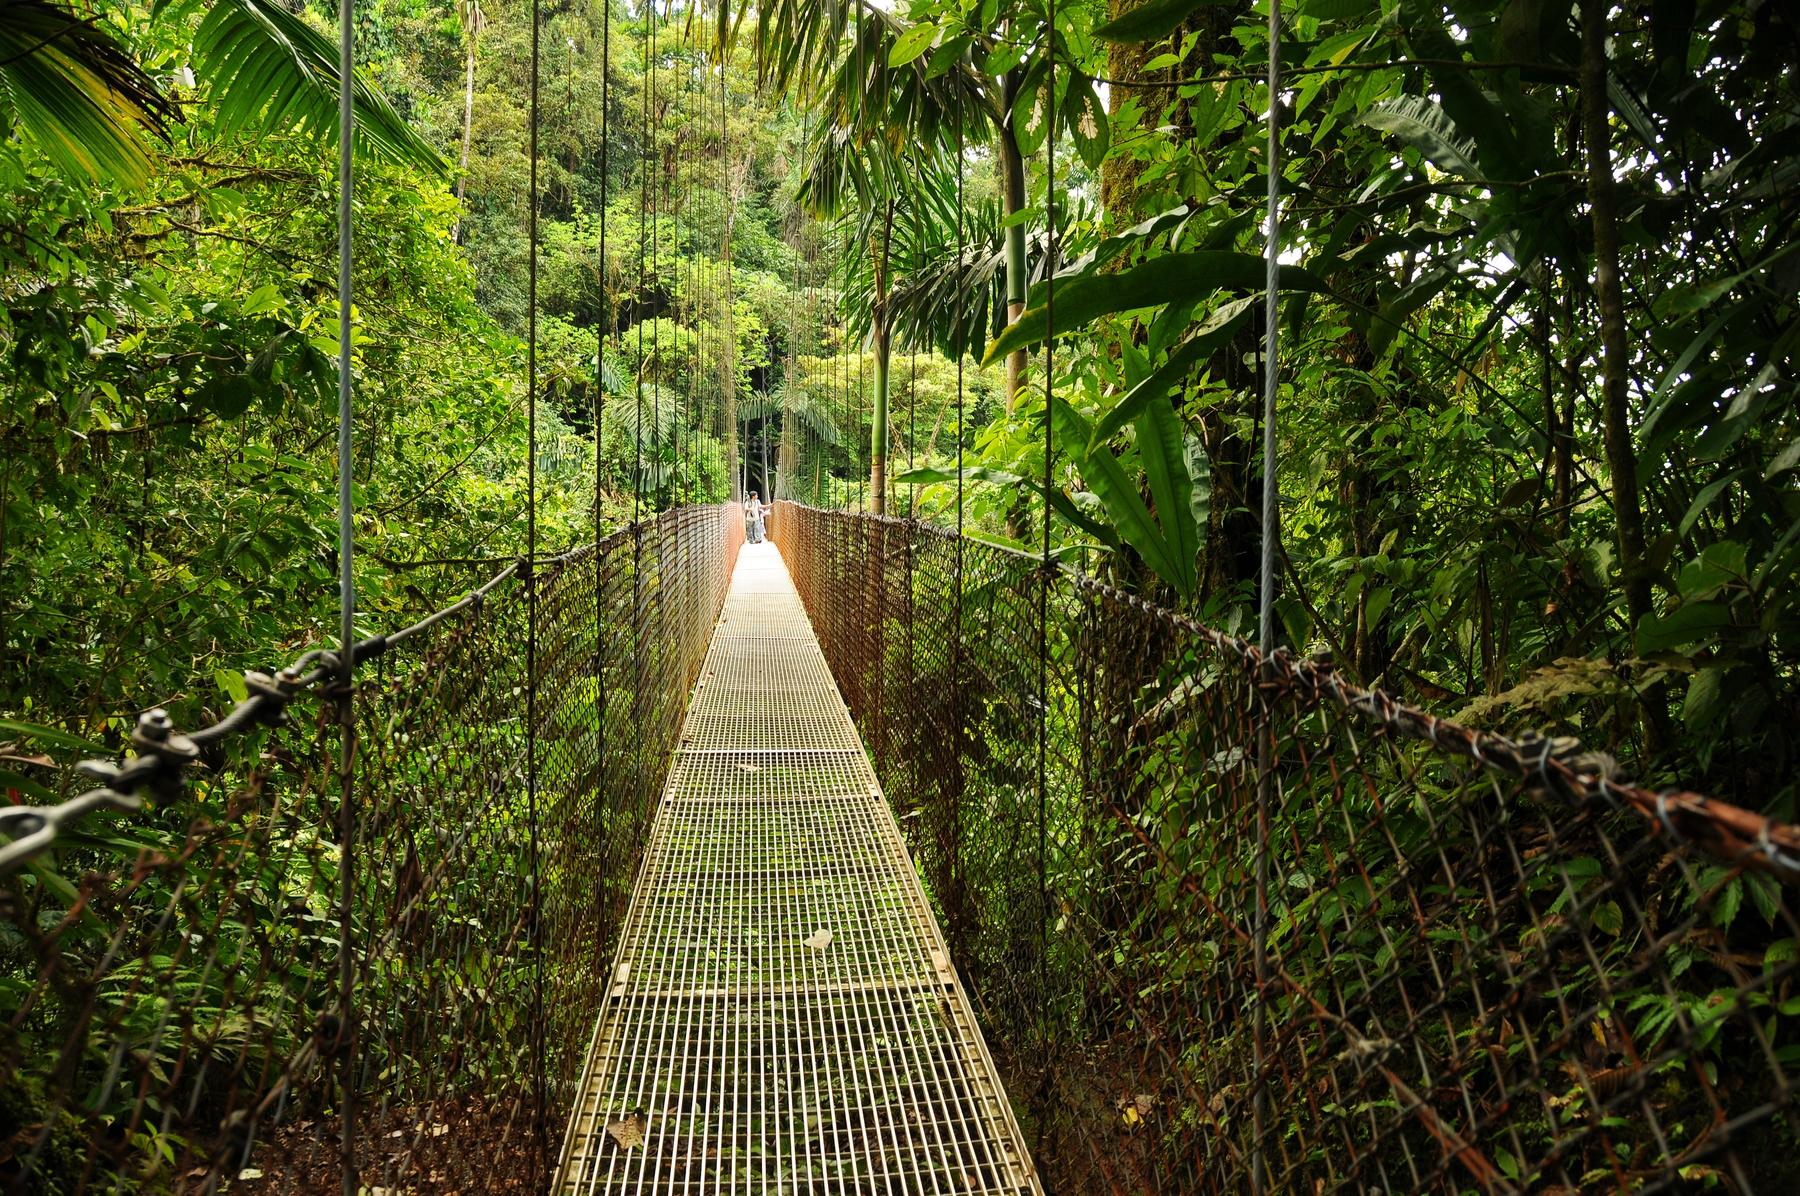 Wildnisreisen: Dschungel-Safari in Costa Rica